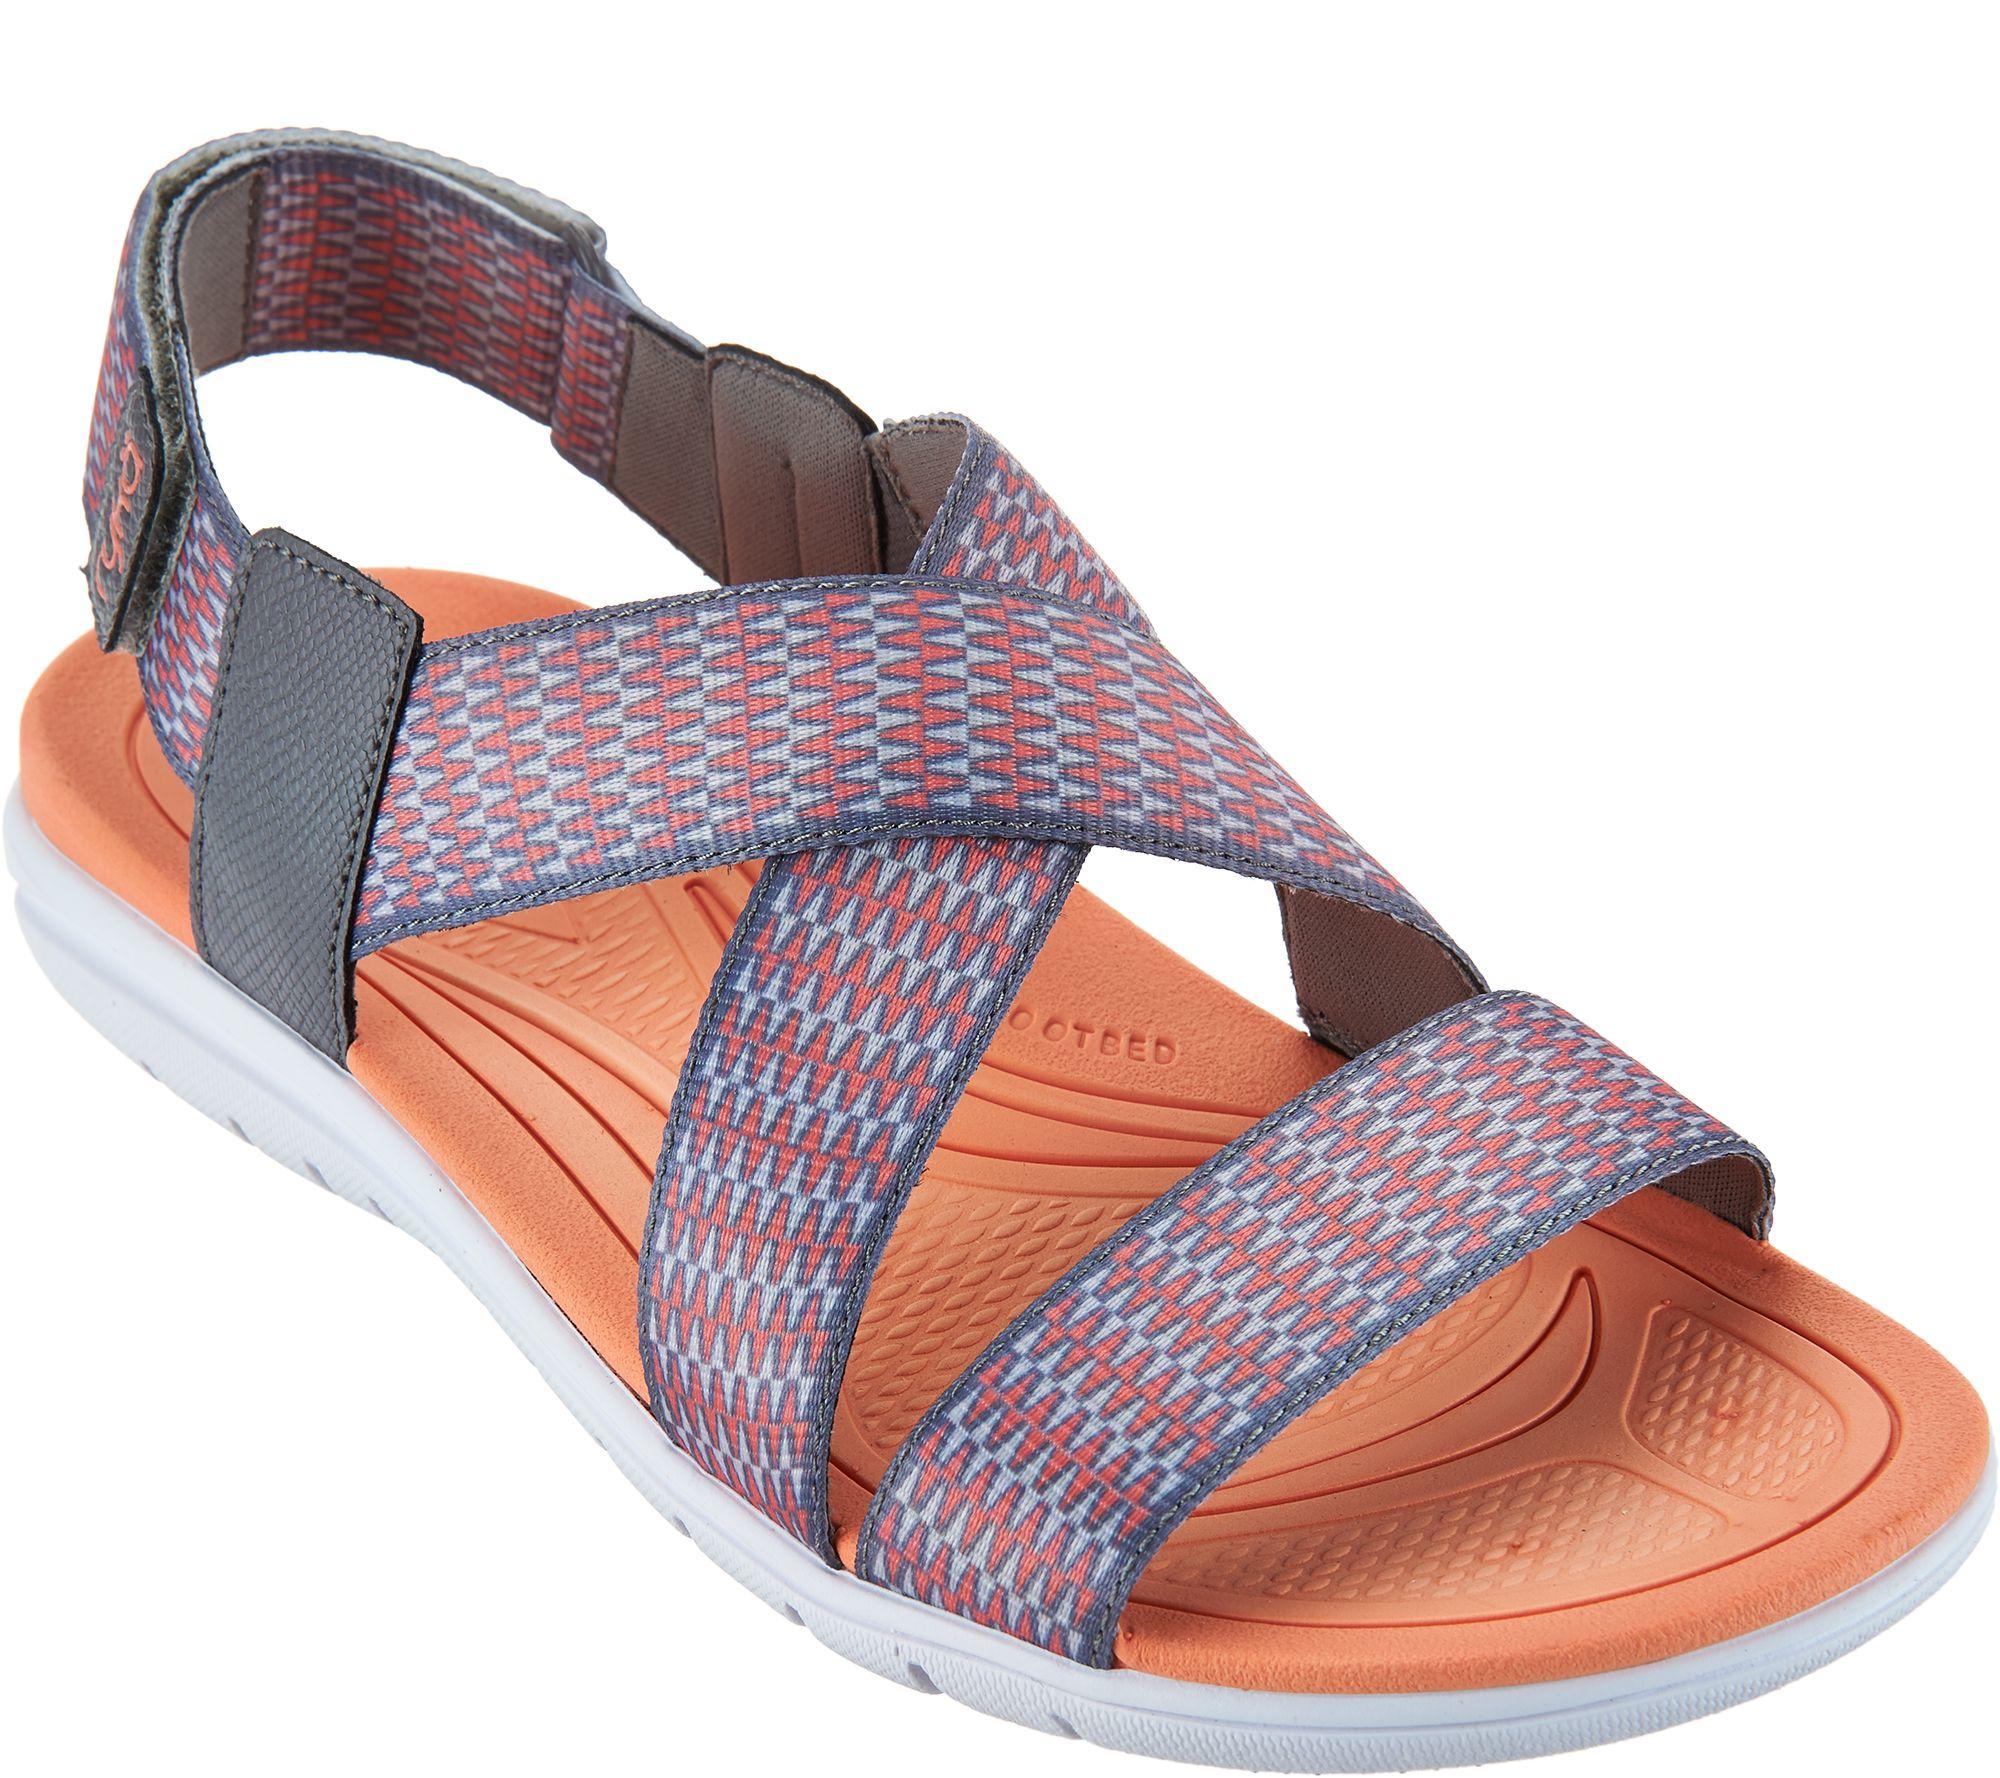 Ryka sandals shoes - Ryka Adjustable Sport Sandals With Css Tech Belmar A289127